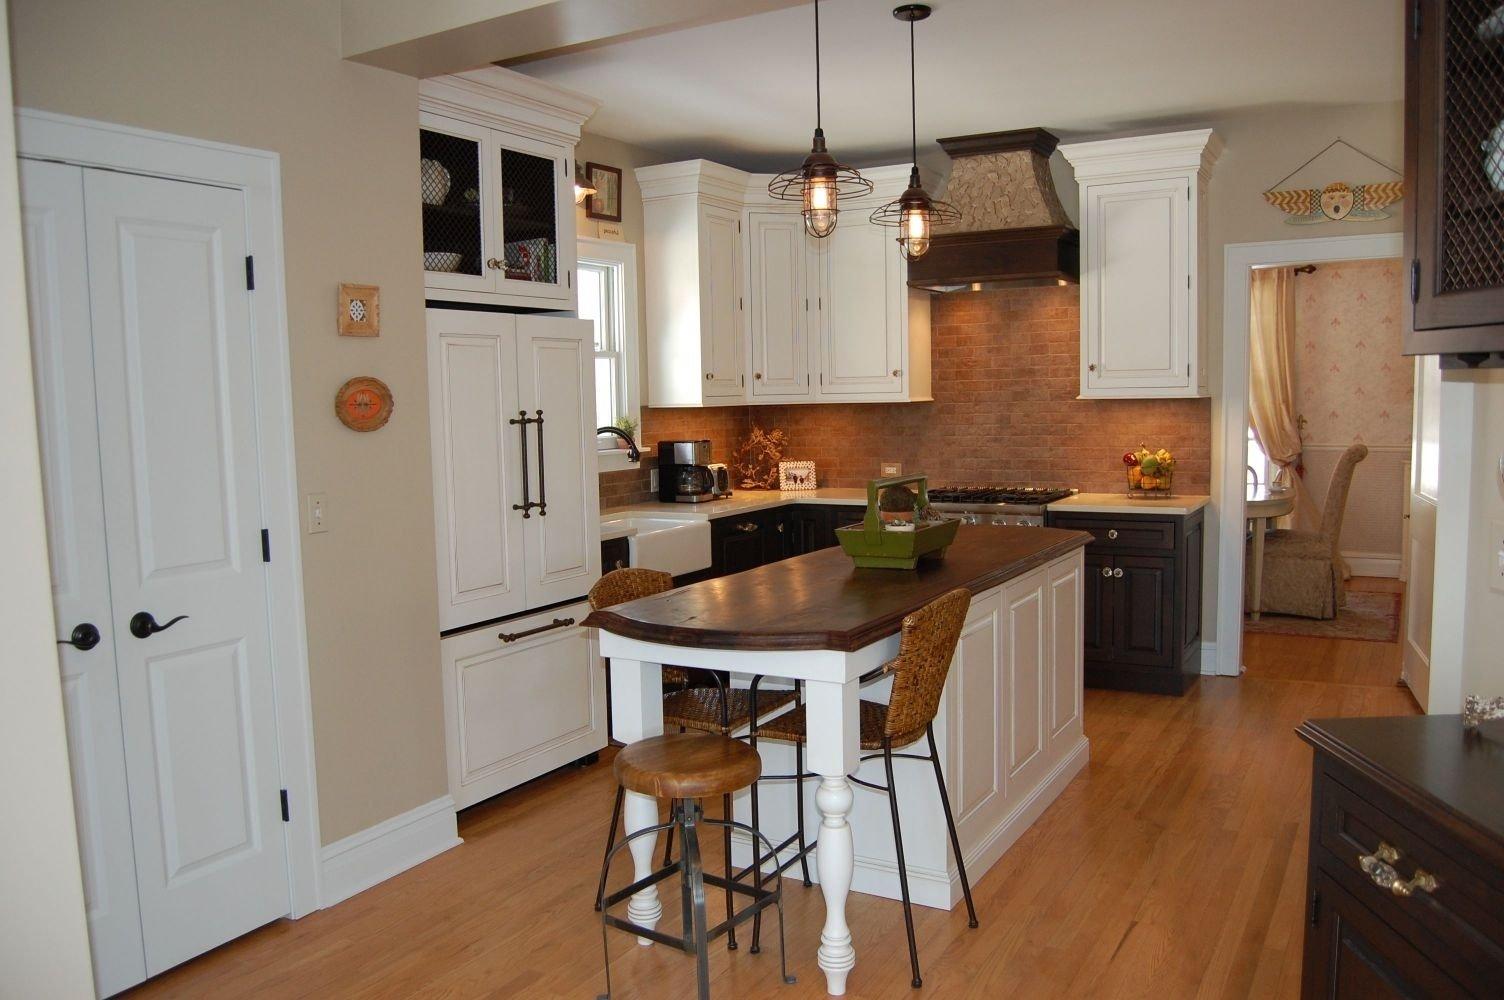 10 Wonderful Small Kitchen Island Ideas With Seating the best small kitchen island ideas with seating cool hda tjihome 2020